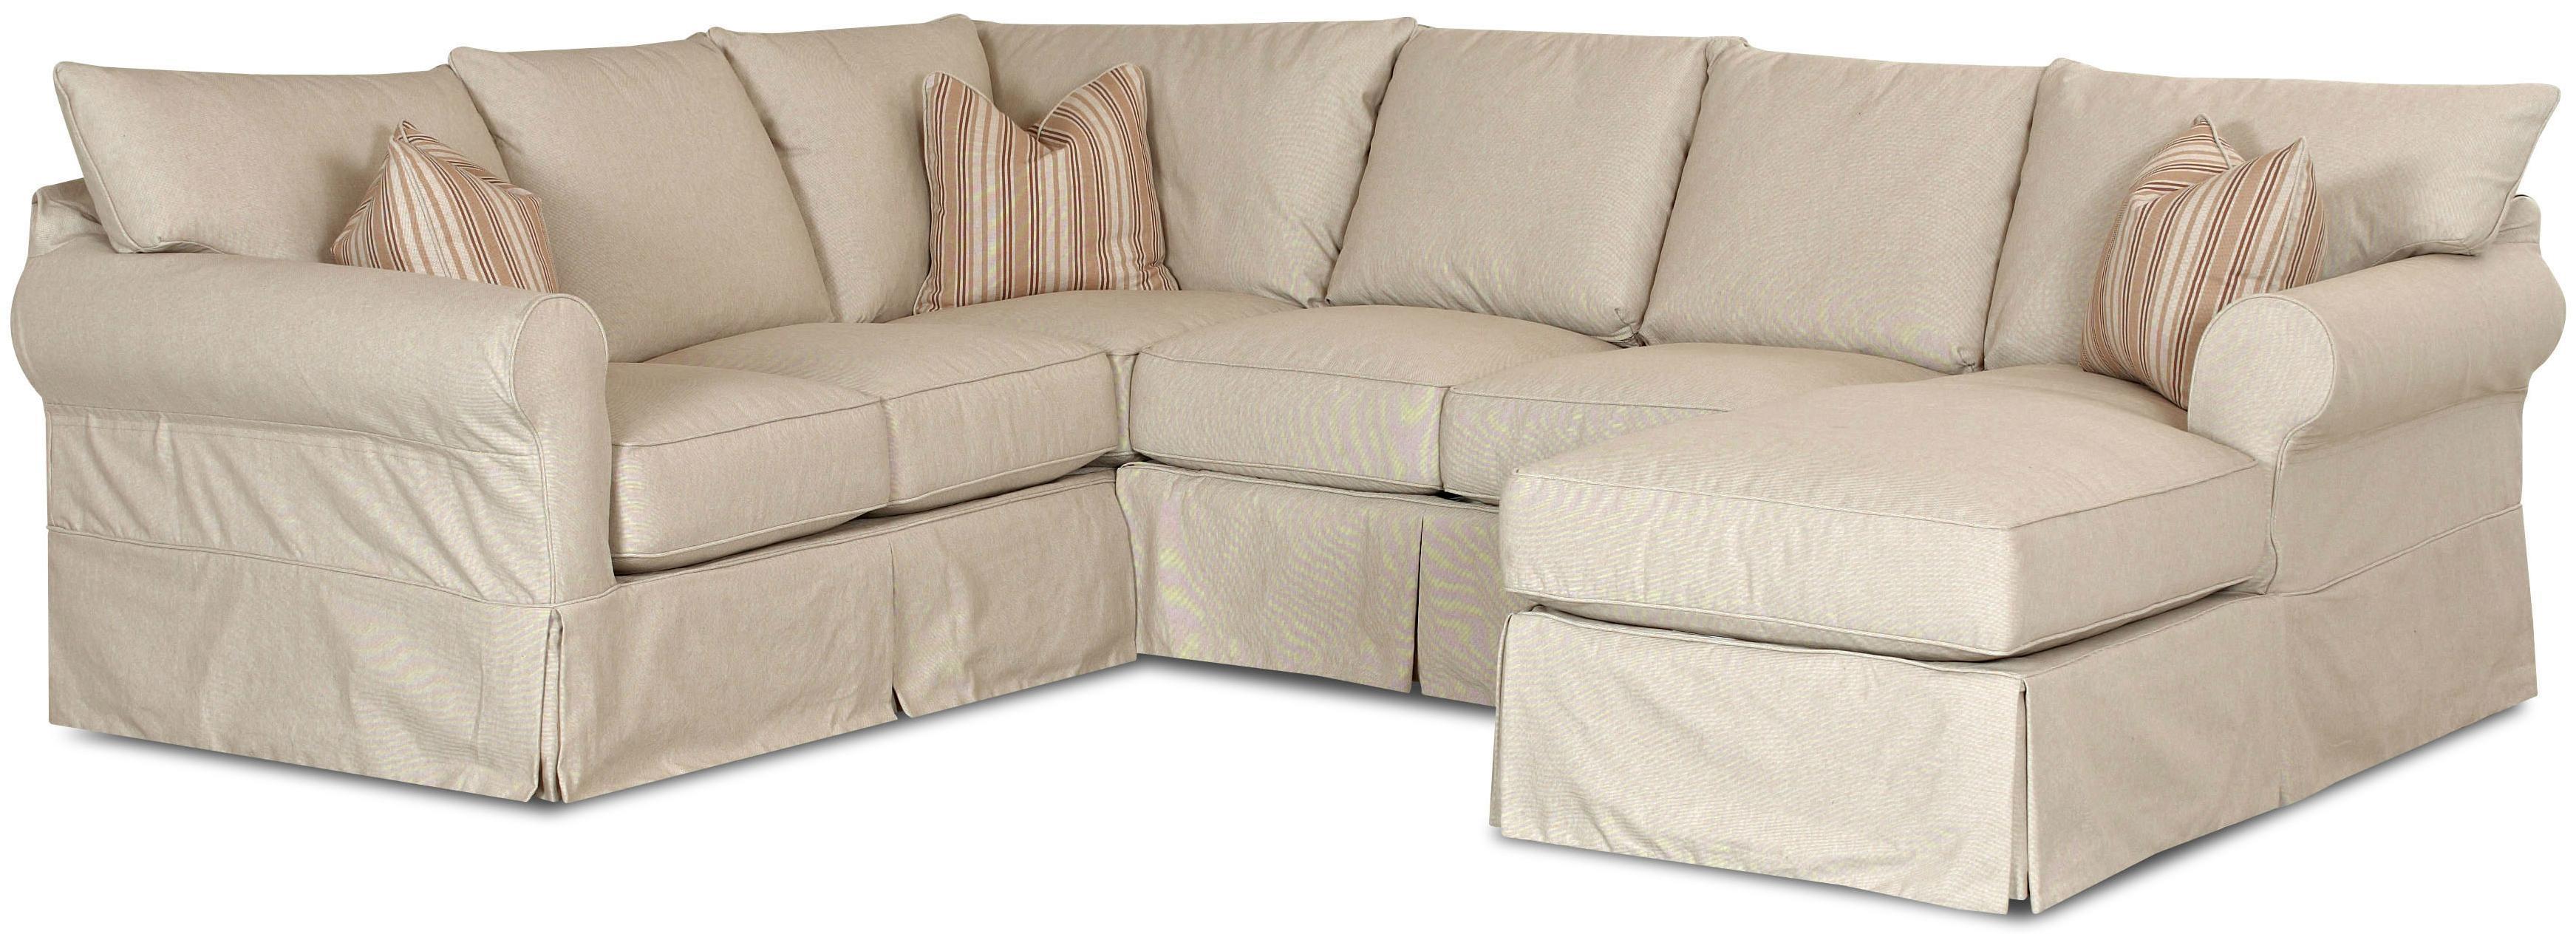 20 Best Ideas Chaise Sofa Covers Sofa Ideas